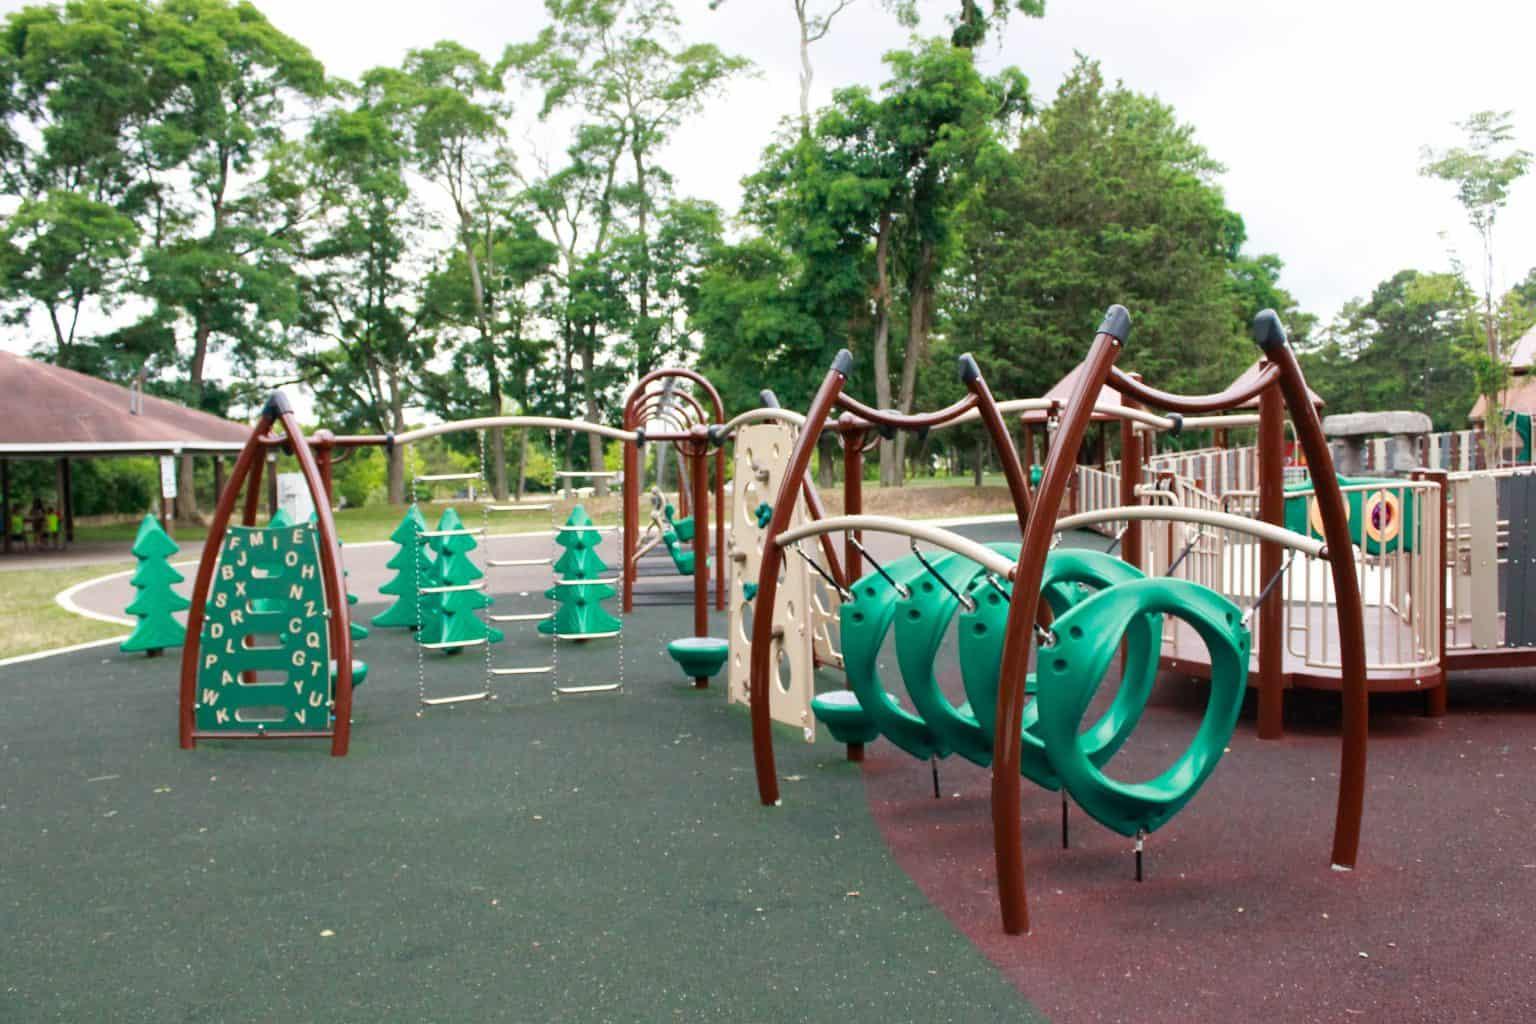 windward-beach-park-playground-brick-nj_27651422523_o-1536x1024